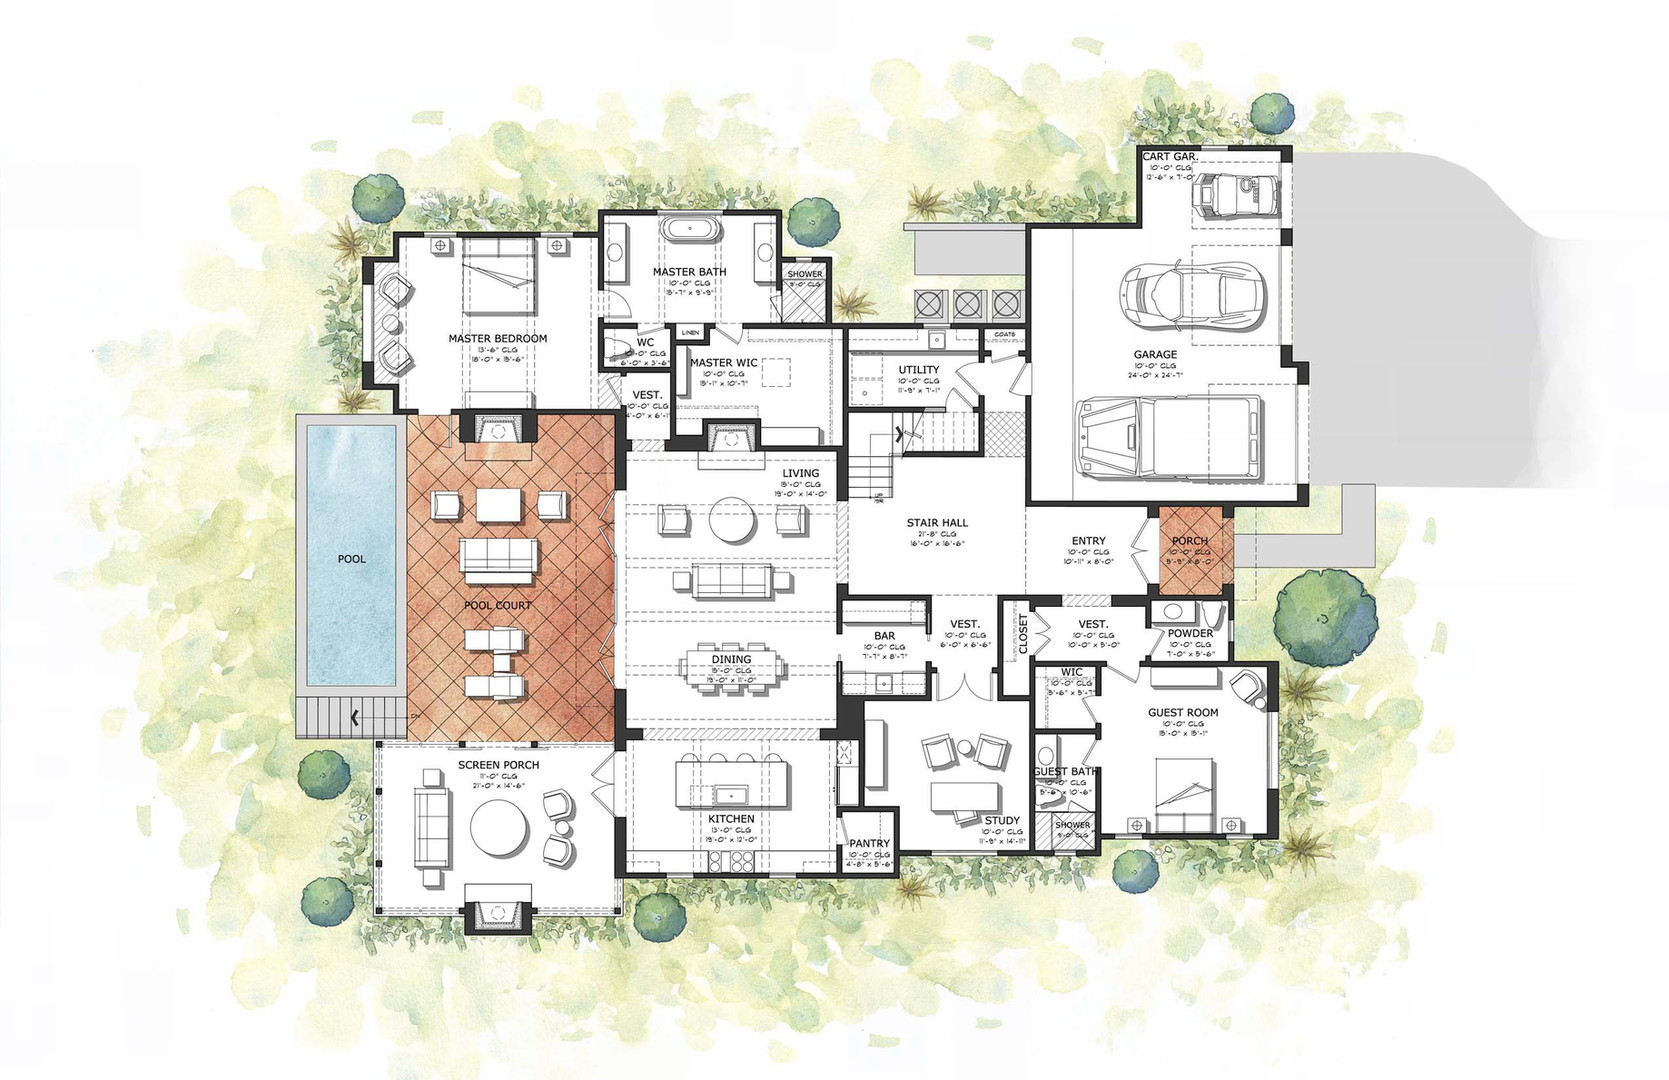 Plan B - Ground Floor